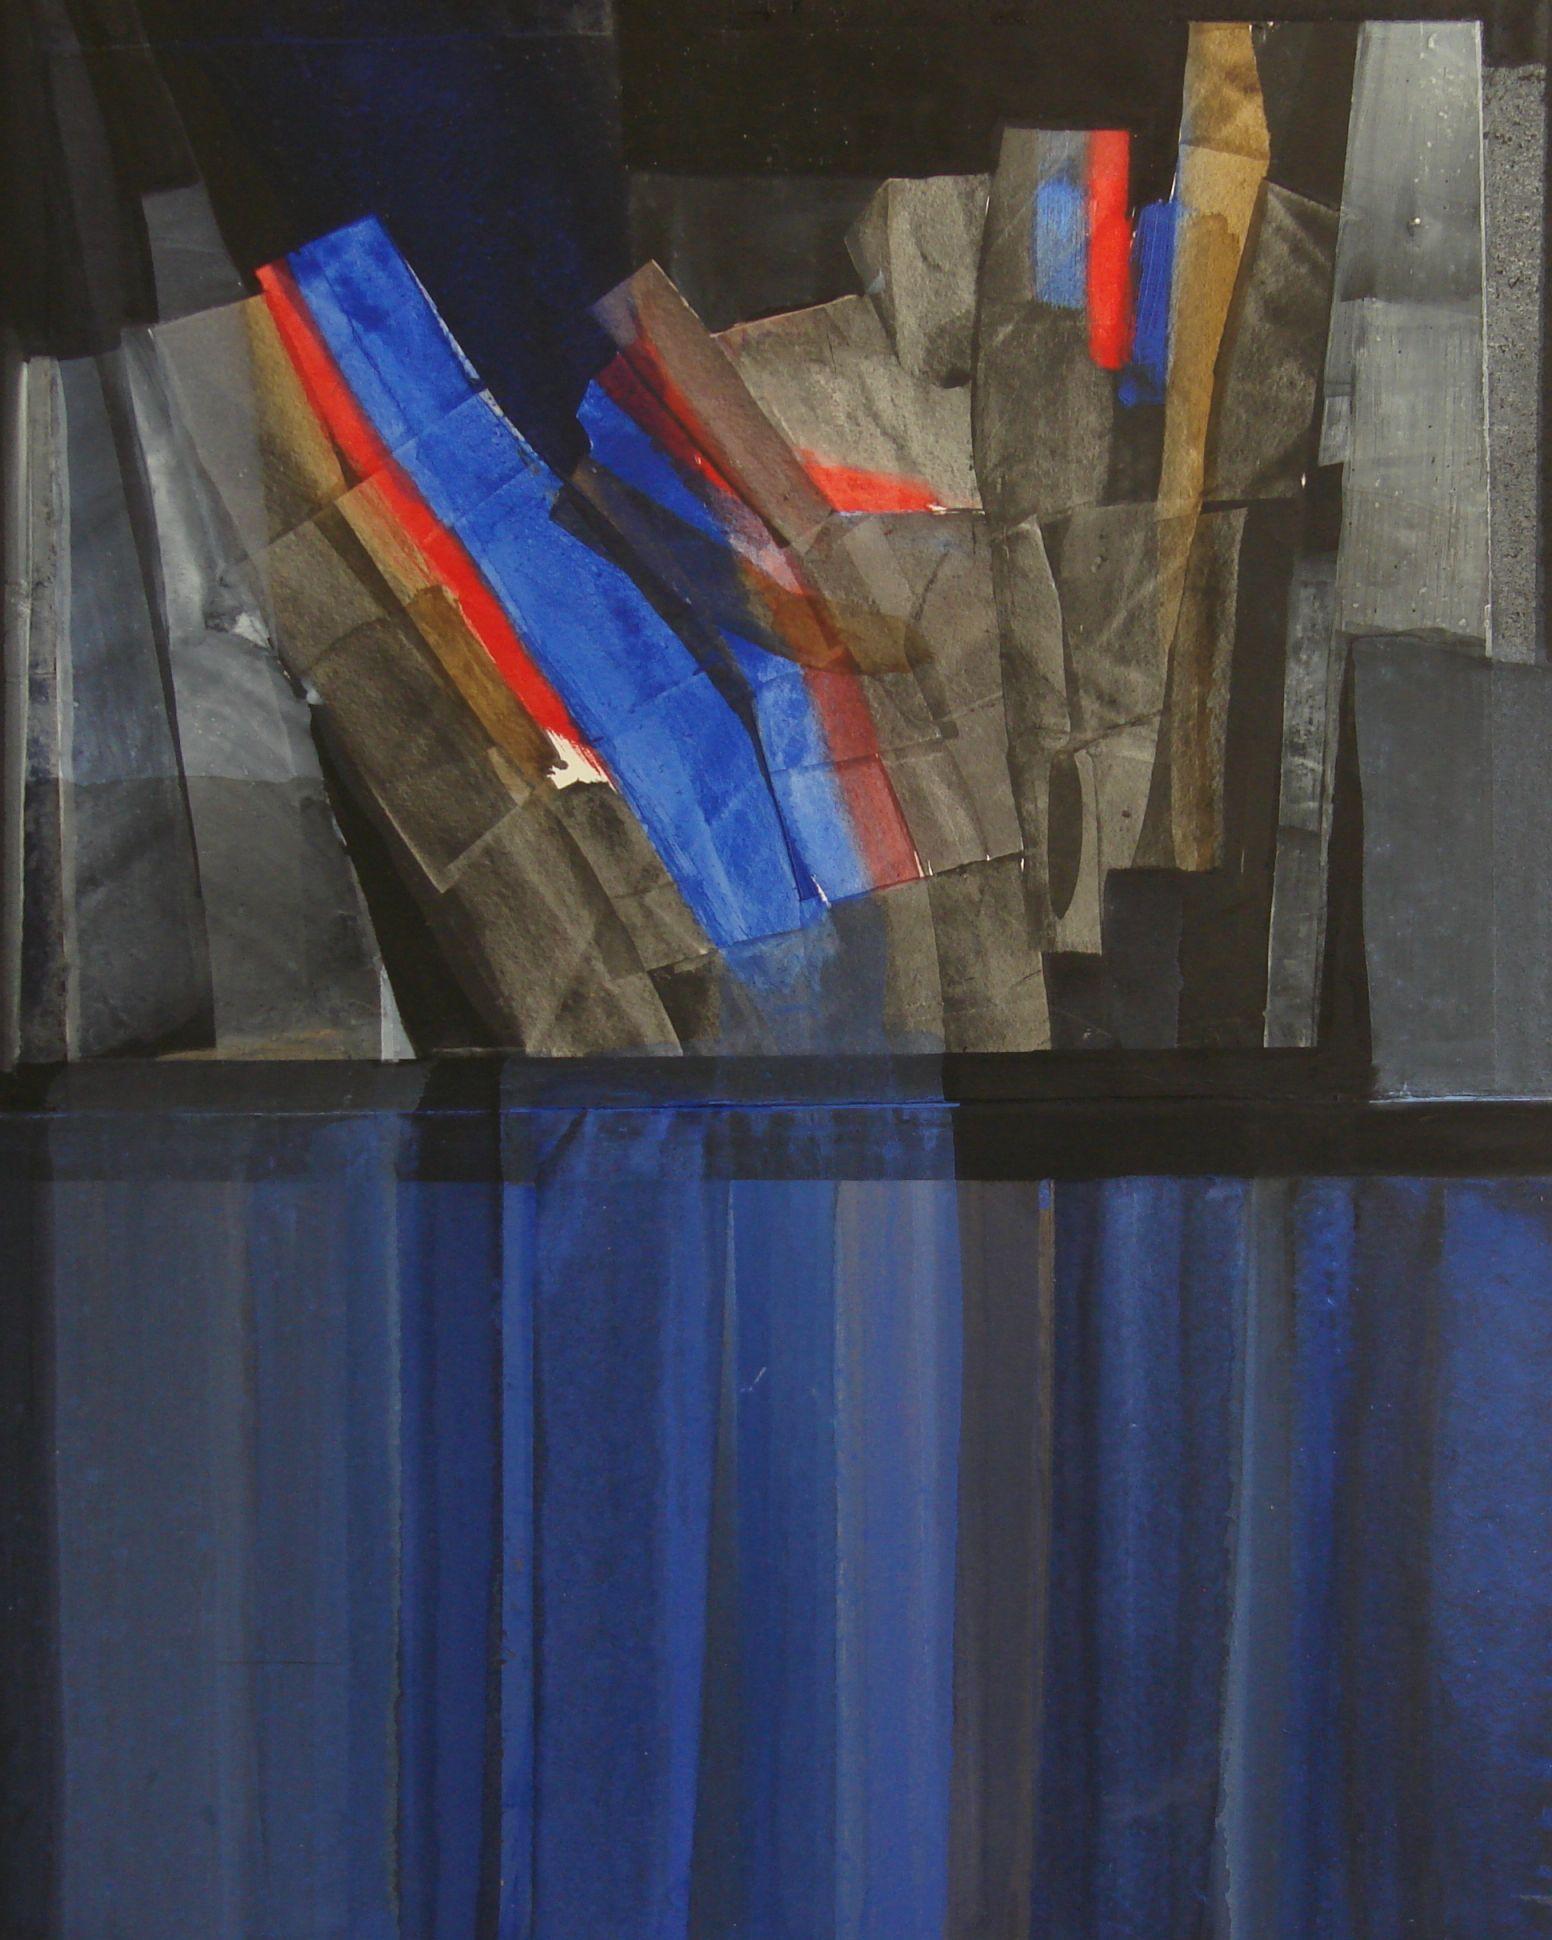 azul (2014) - Carles Guasch